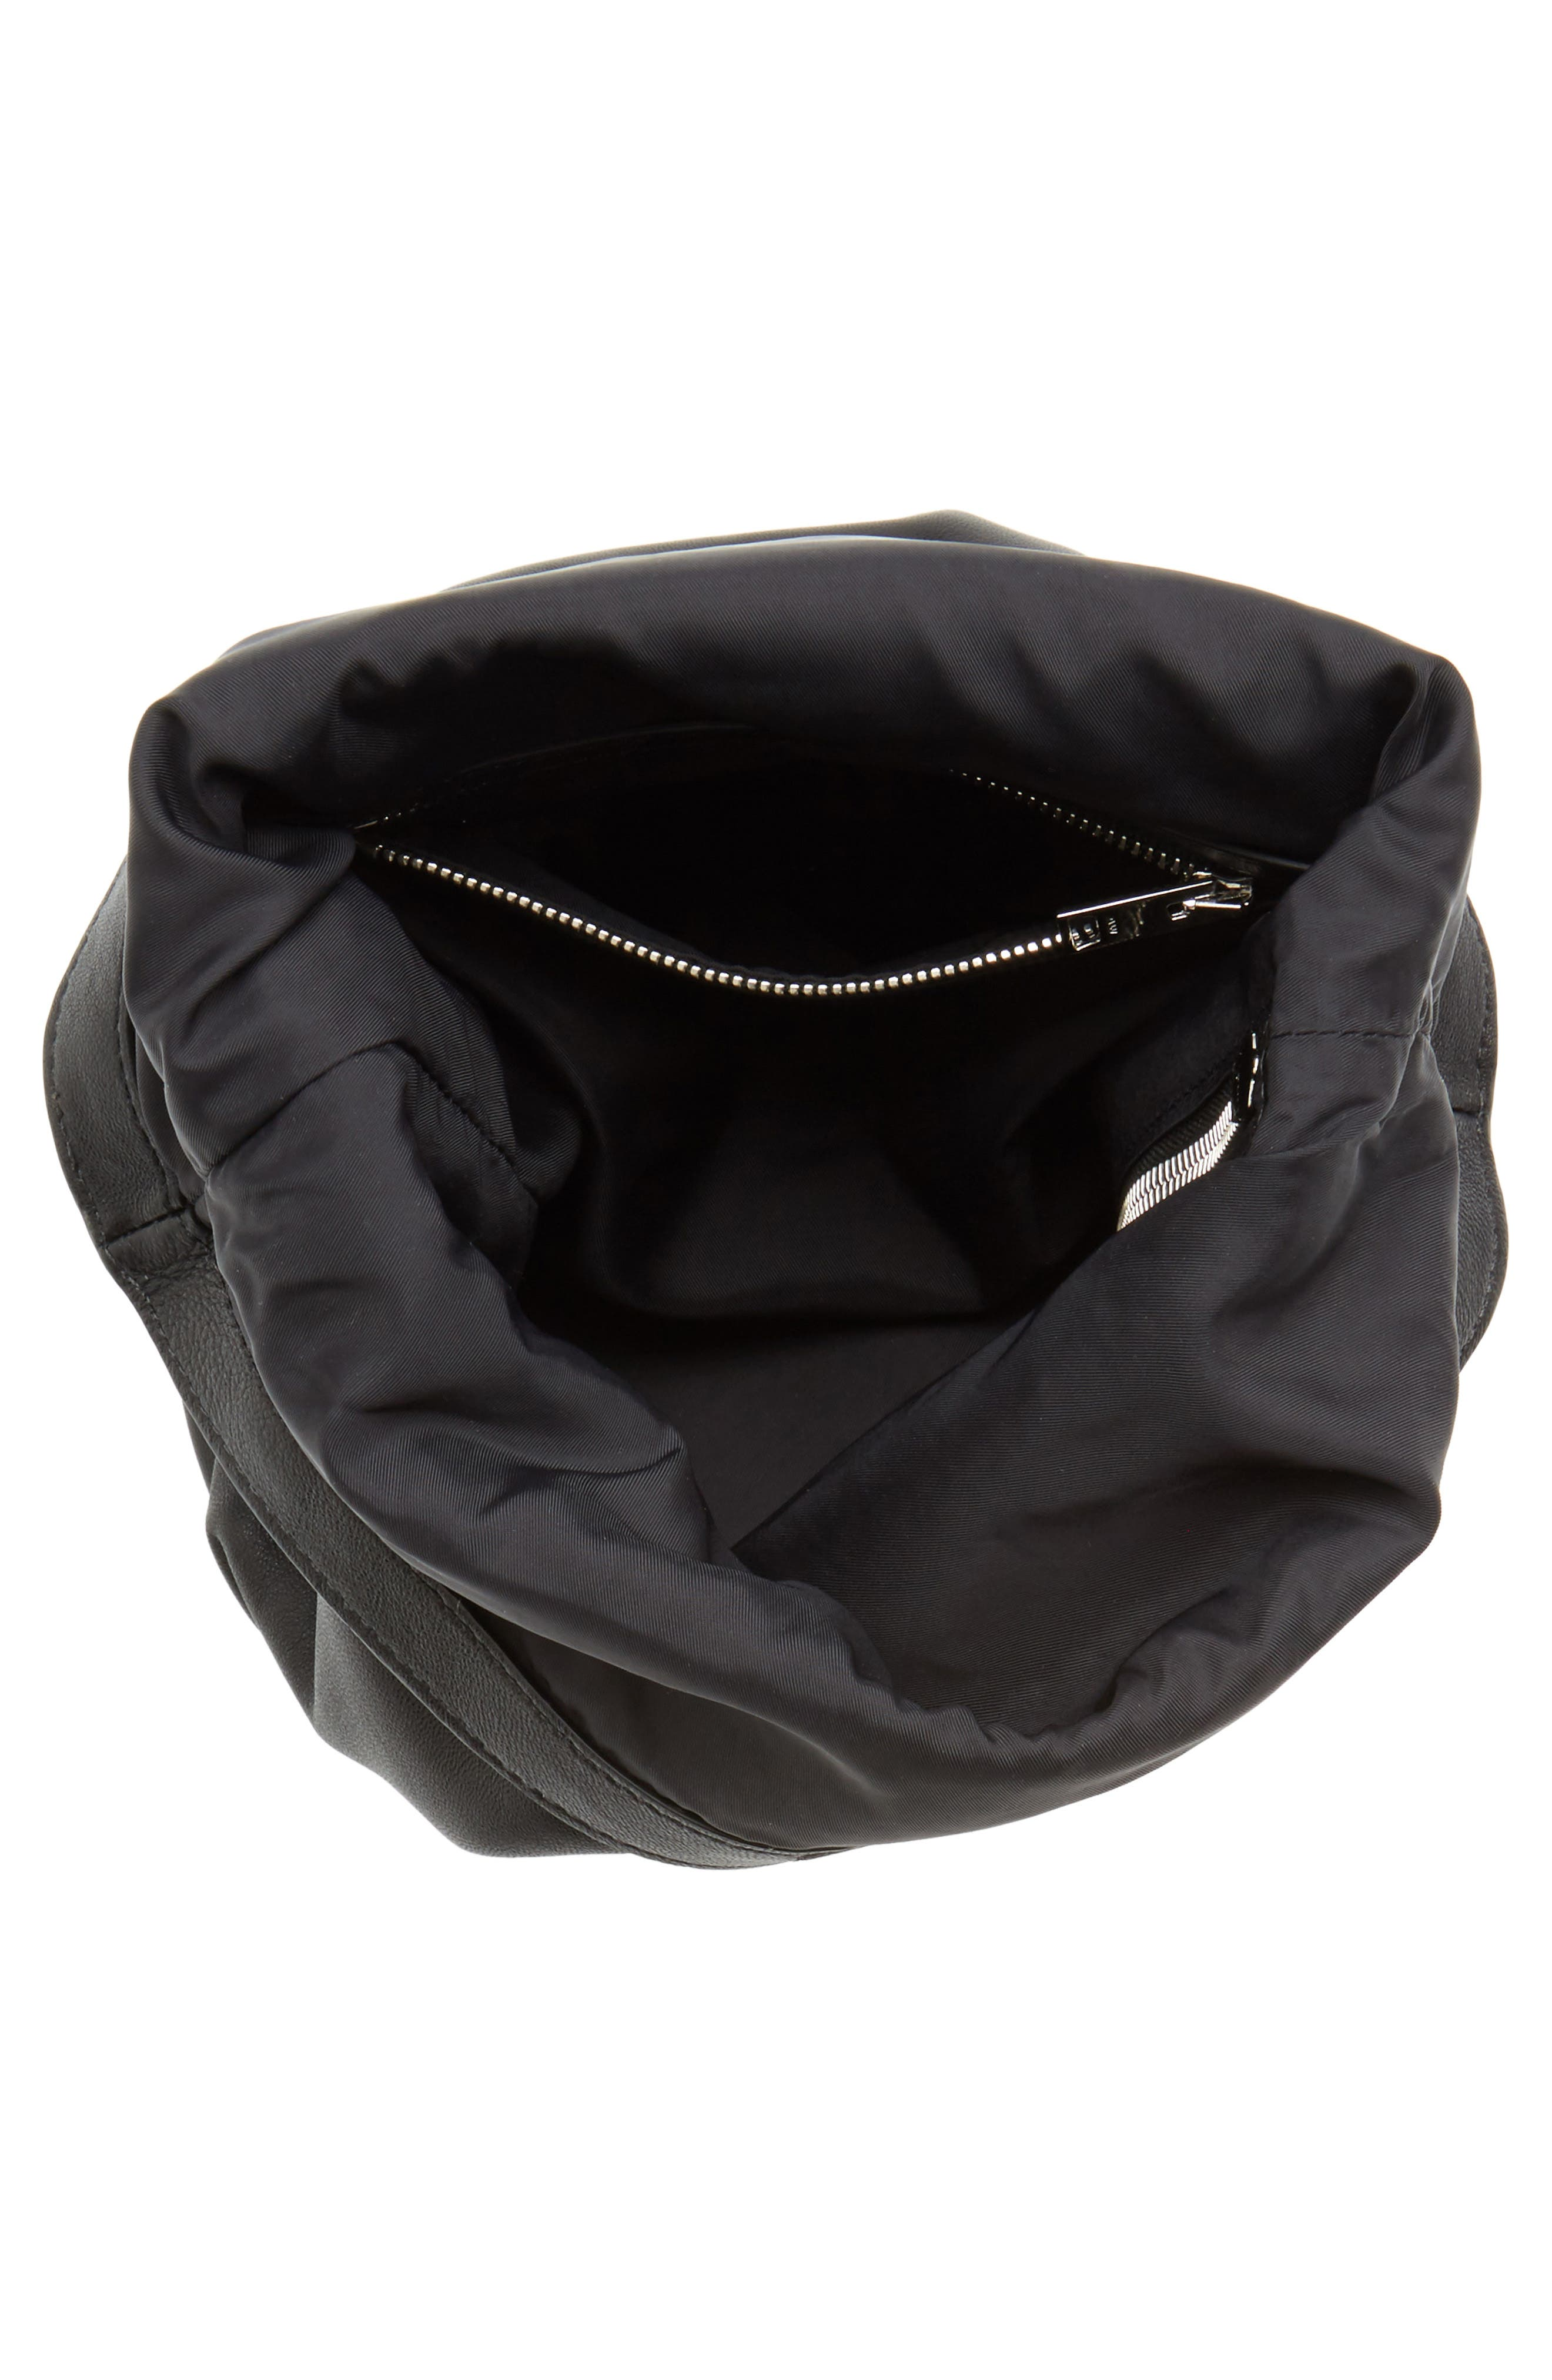 Attica Leather Bucket Bag,                             Alternate thumbnail 5, color,                             001